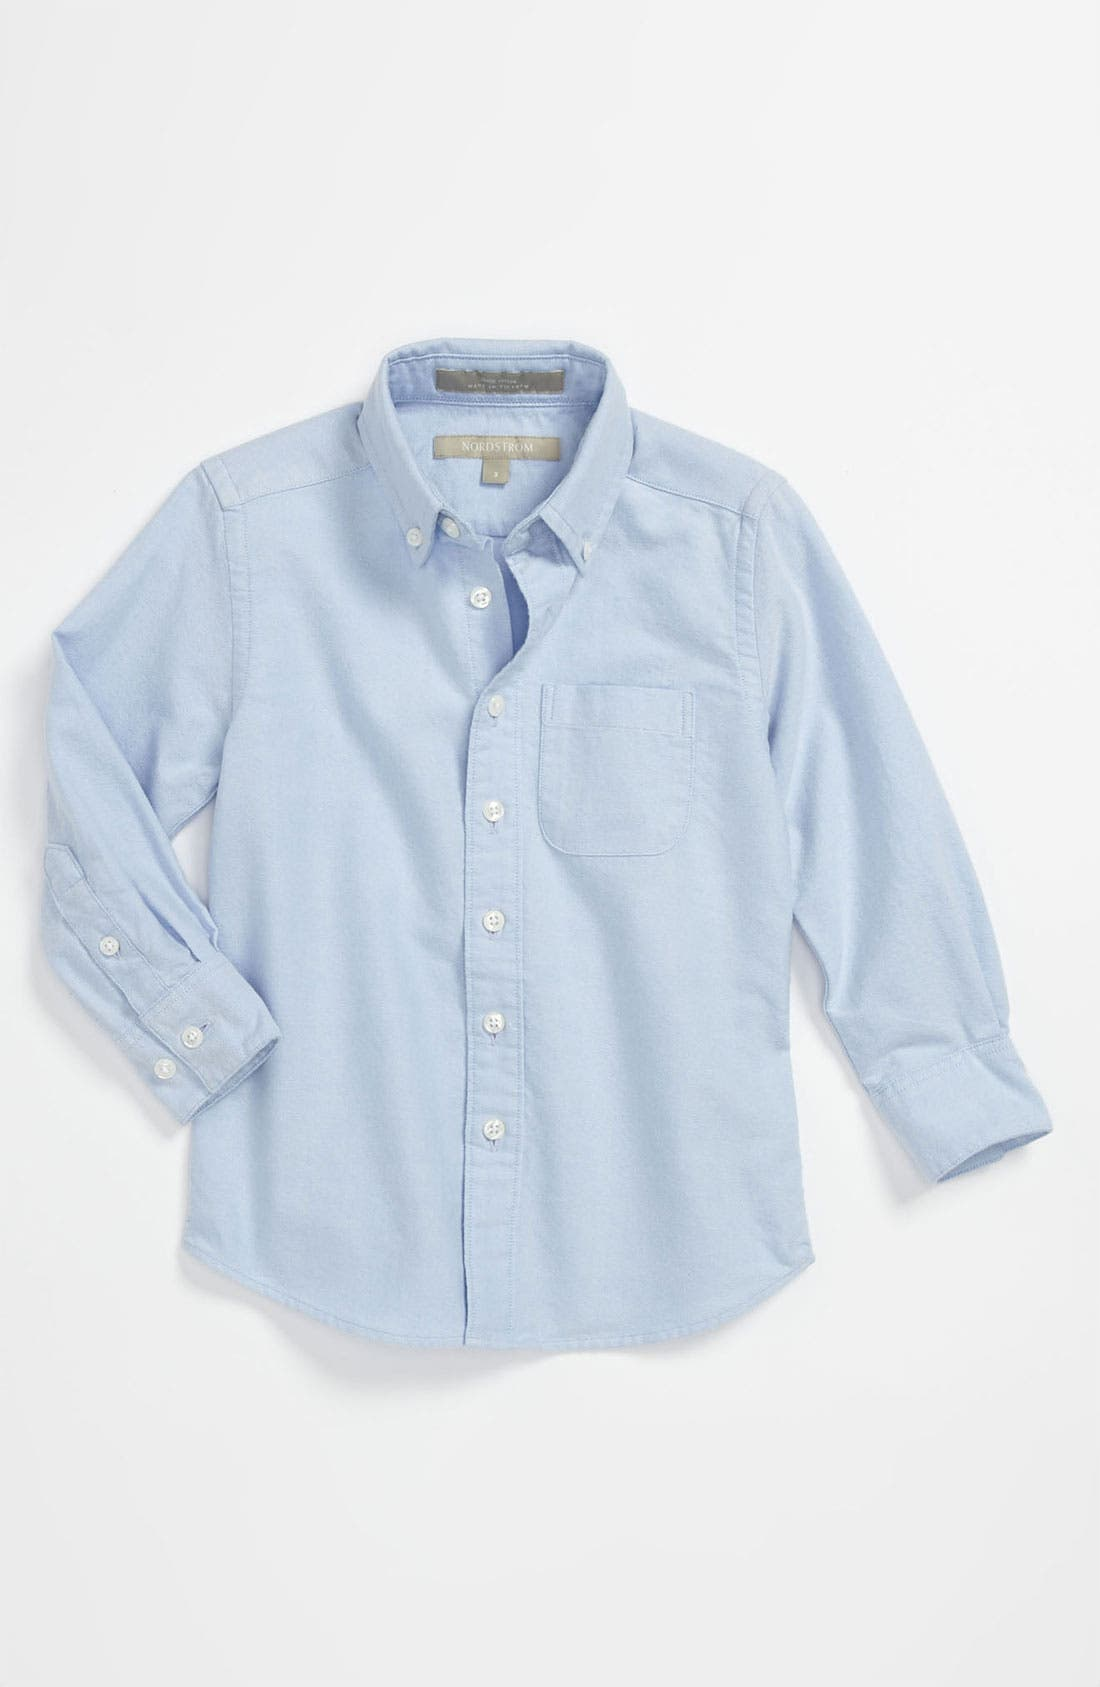 Alternate Image 1 Selected - Nordstrom 'Michael' Oxford Woven Shirt (Toddler)